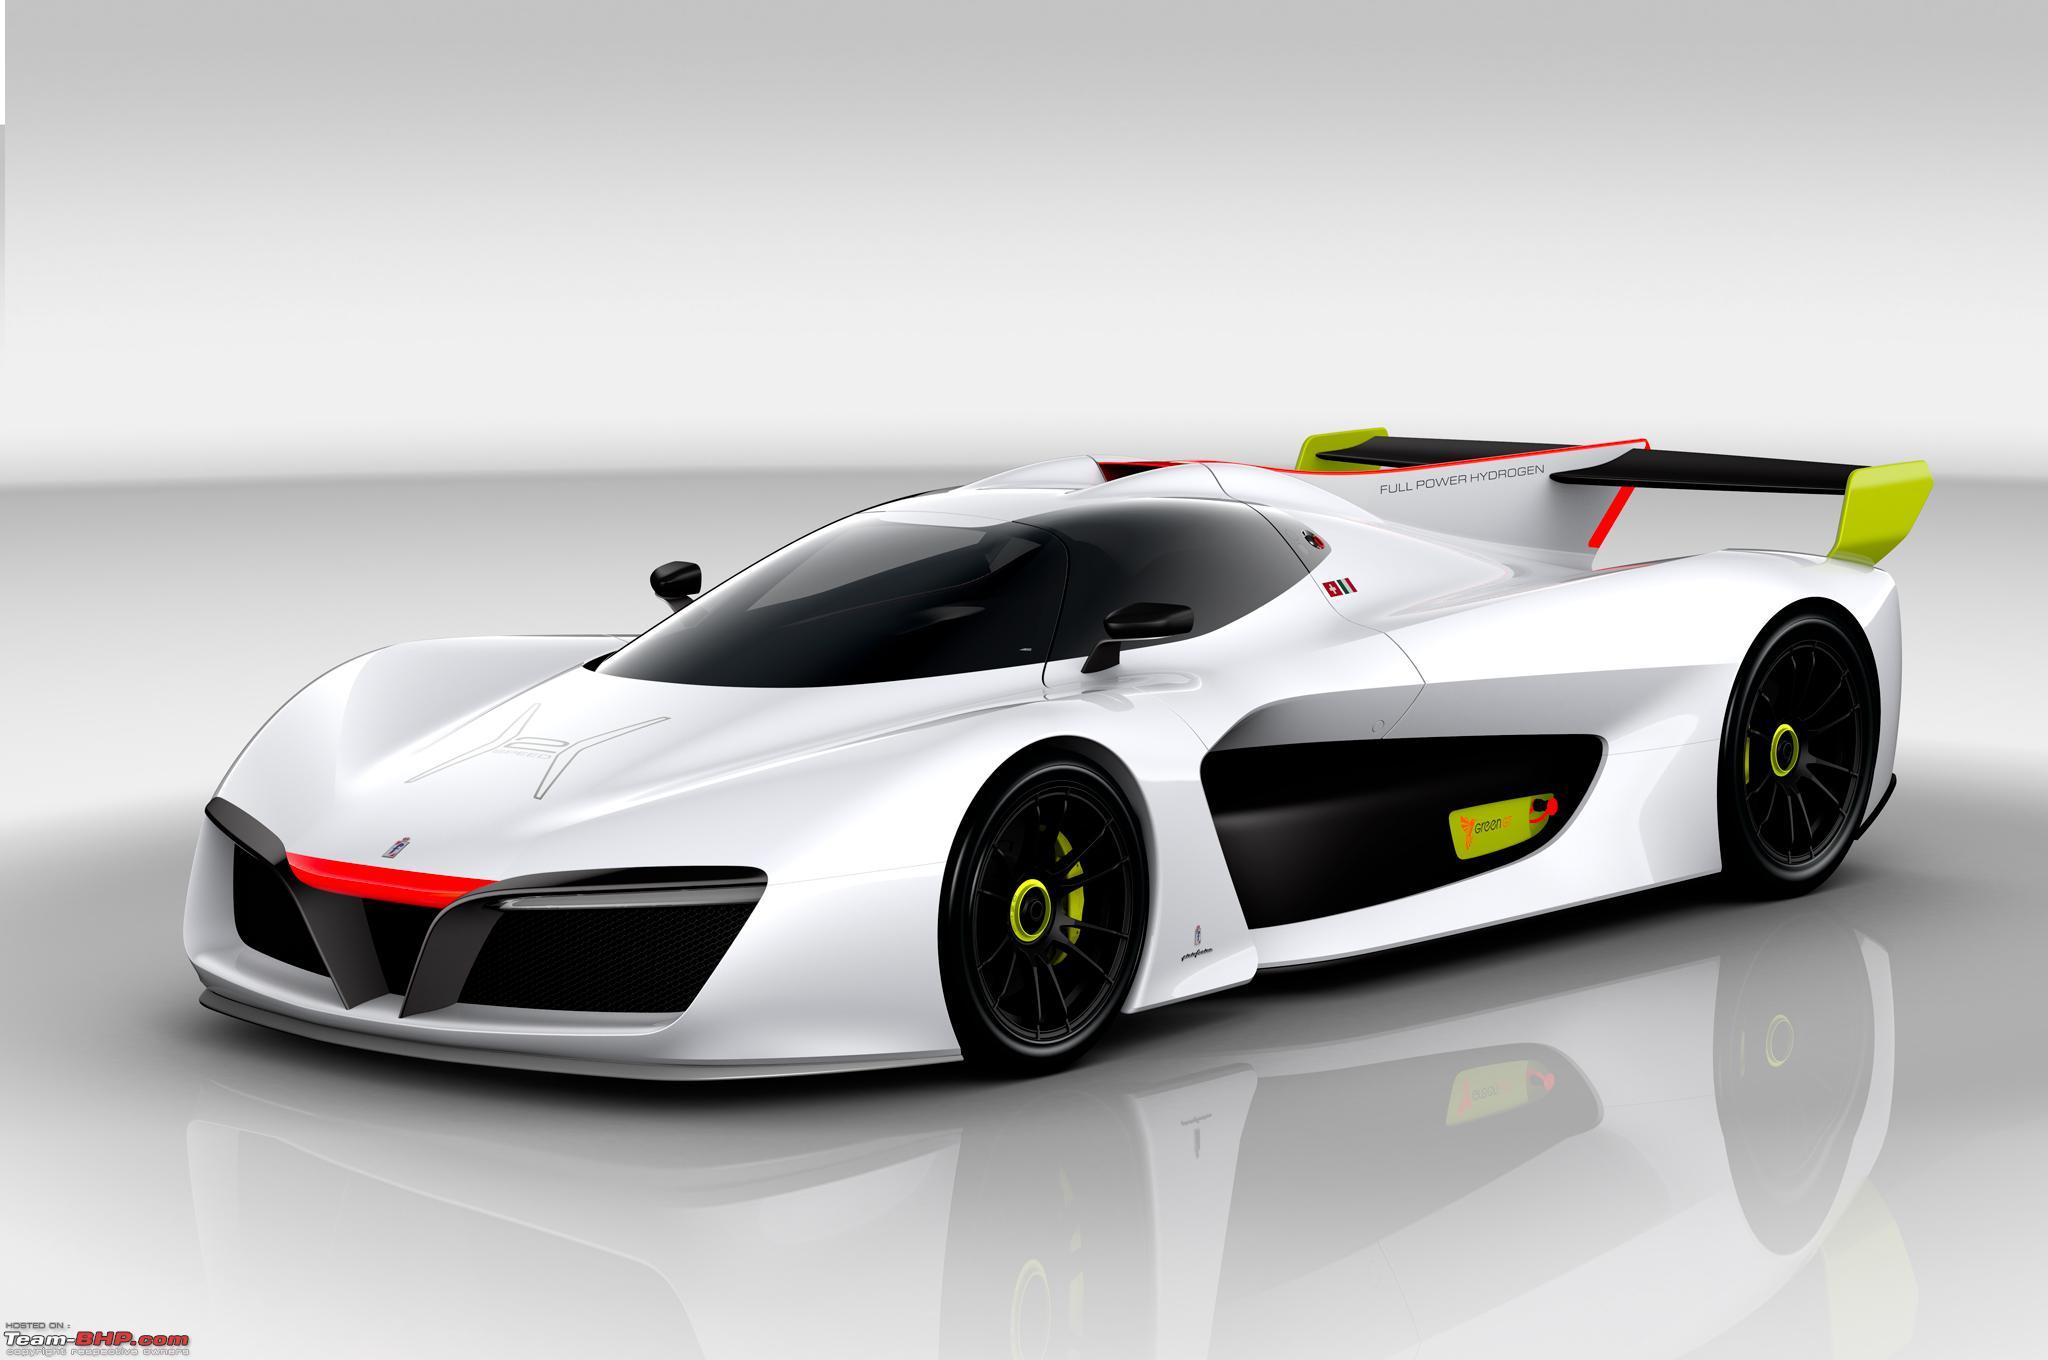 Mahindra To Use Pininfarina Branding For Luxury Cars Team Bhp